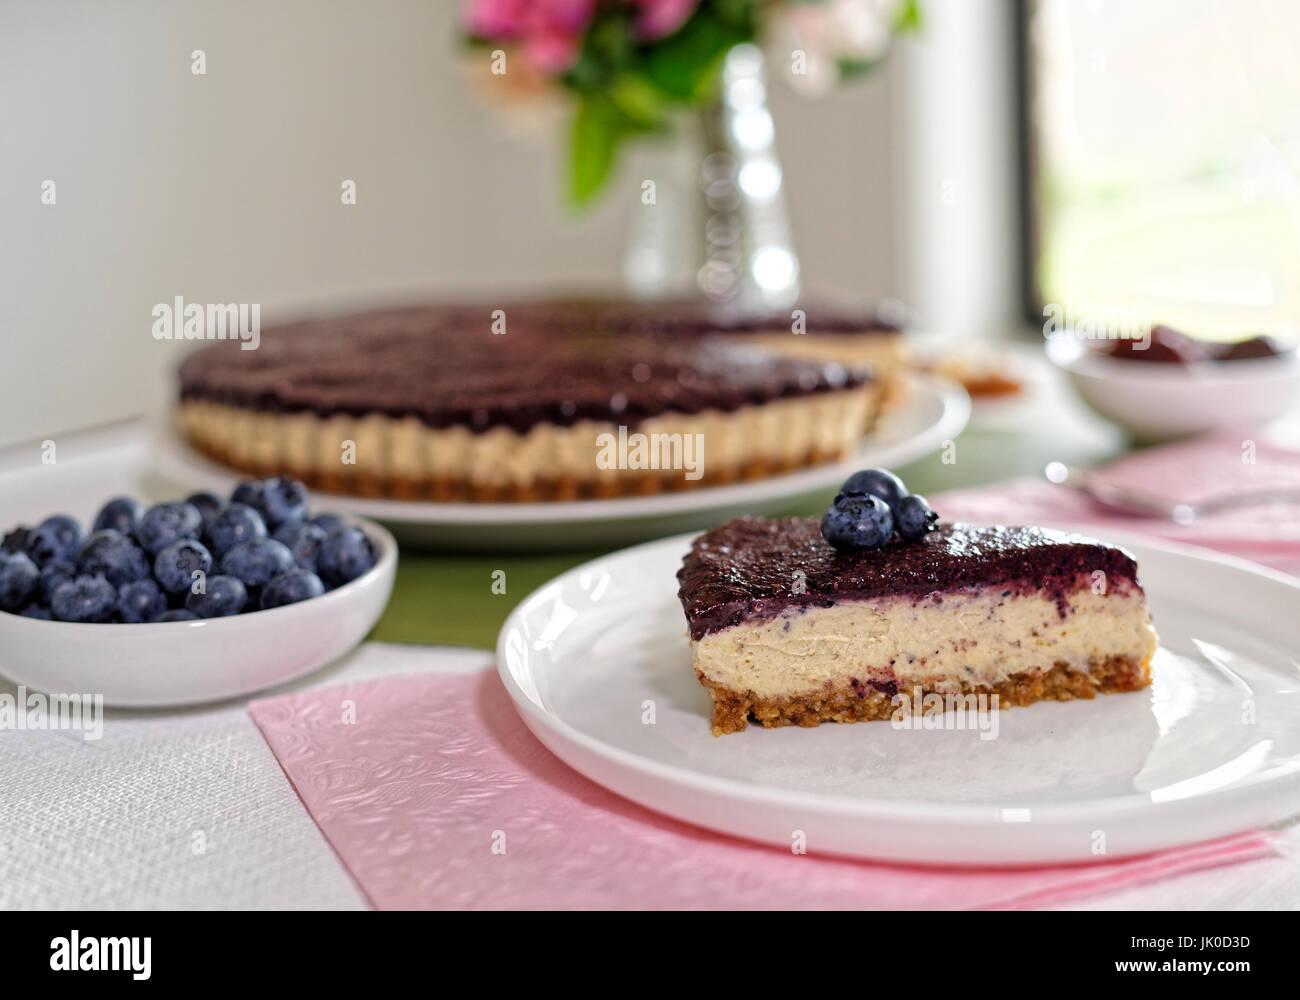 Vegan cheesecake con mirtilli e noci di acagiù e date Foto Stock